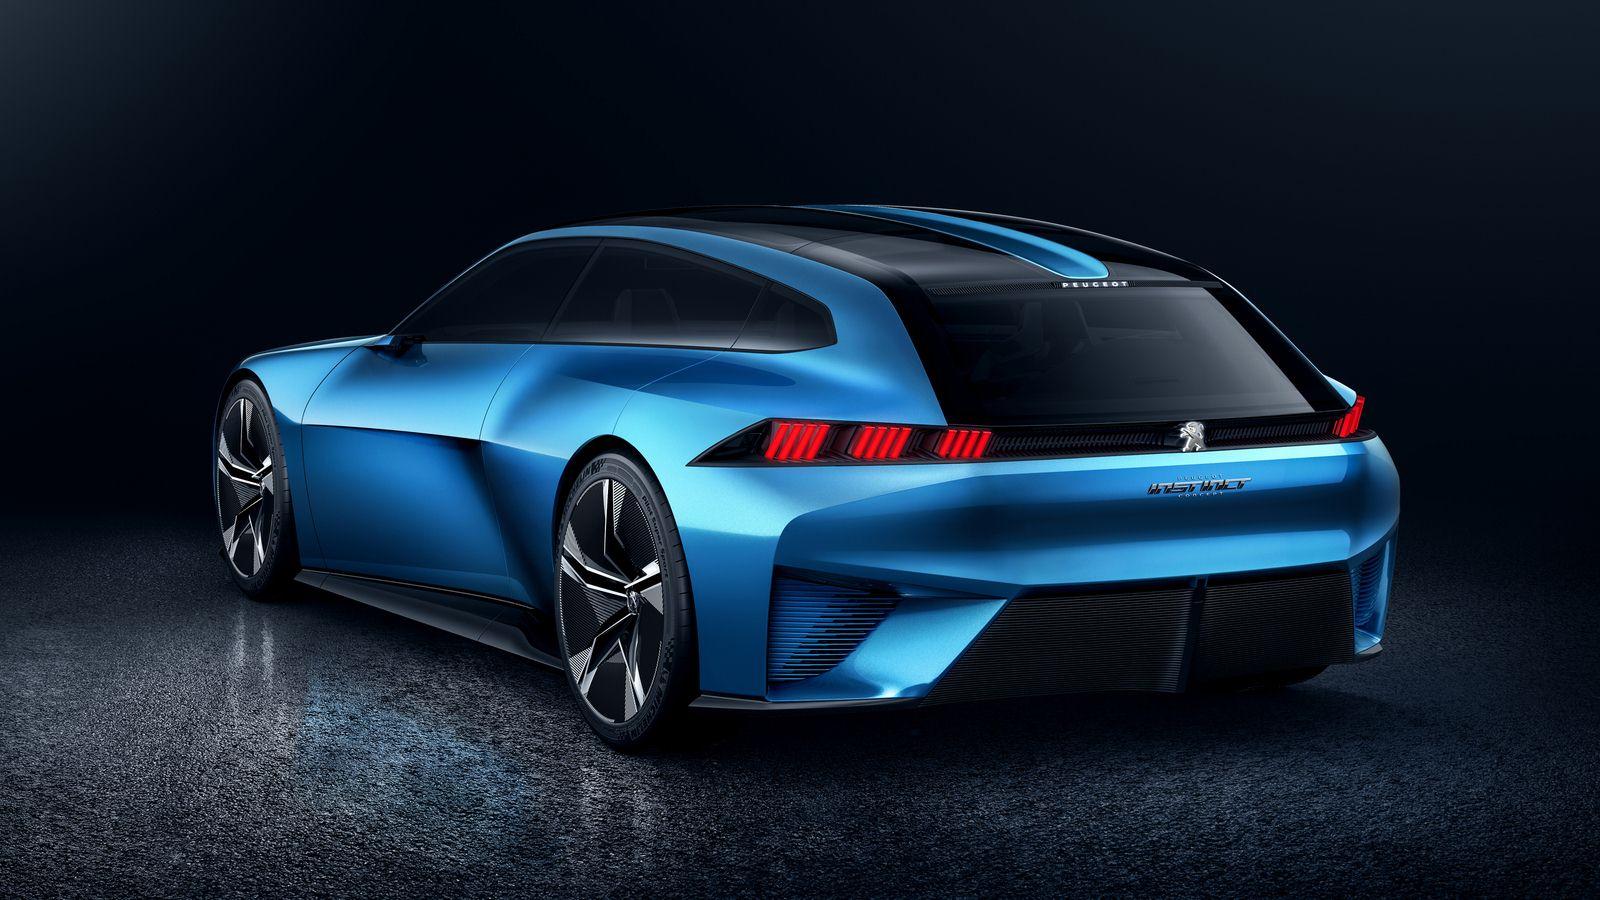 2017-Peugeot-Instinct-Concept-04